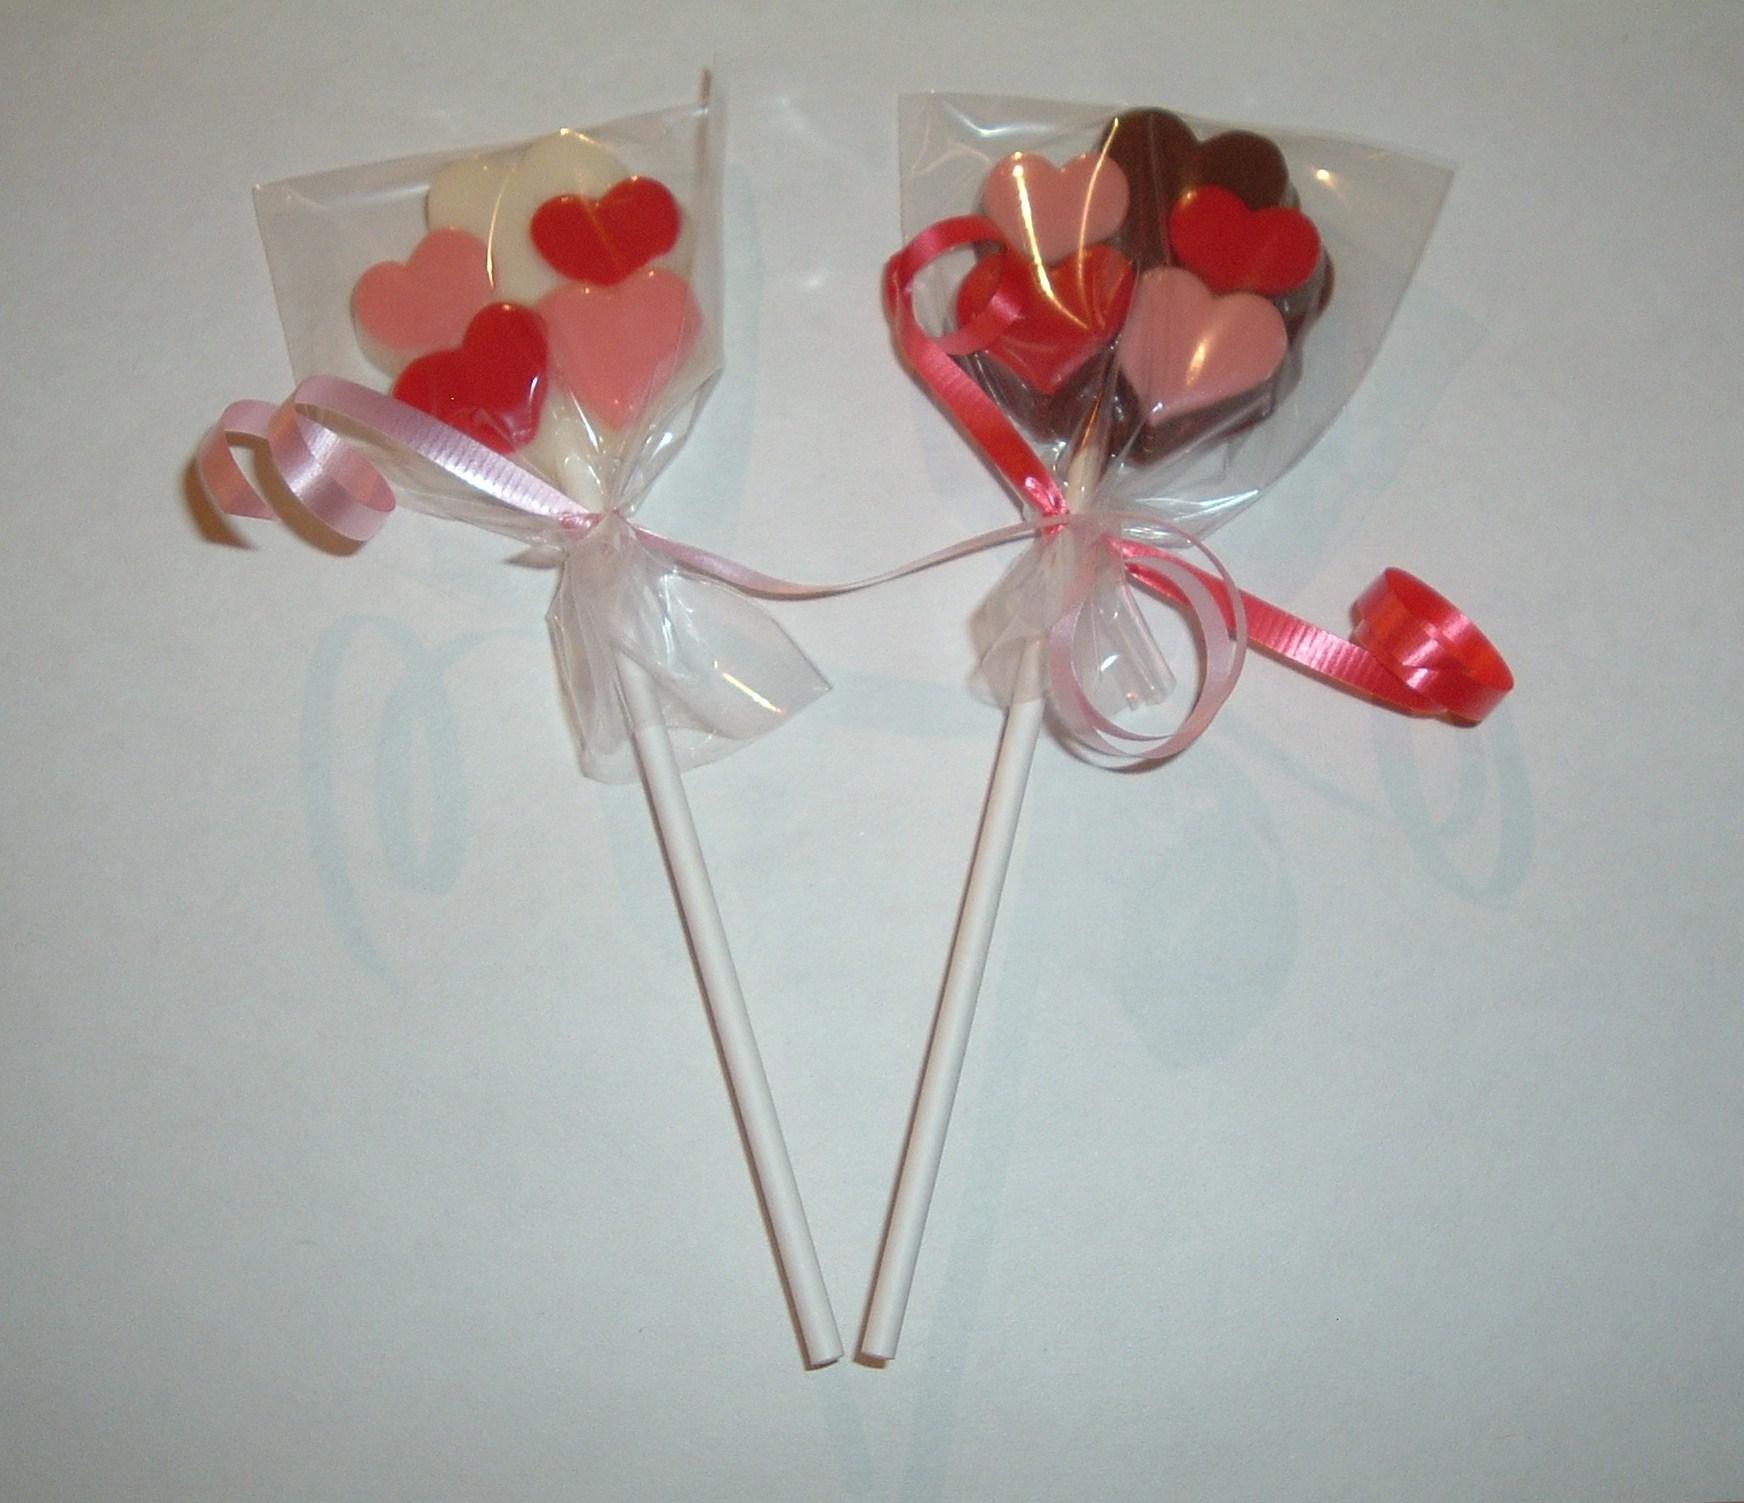 SherryLynn Creations - Valentines Chocolate Heart Lollipops Set of 6